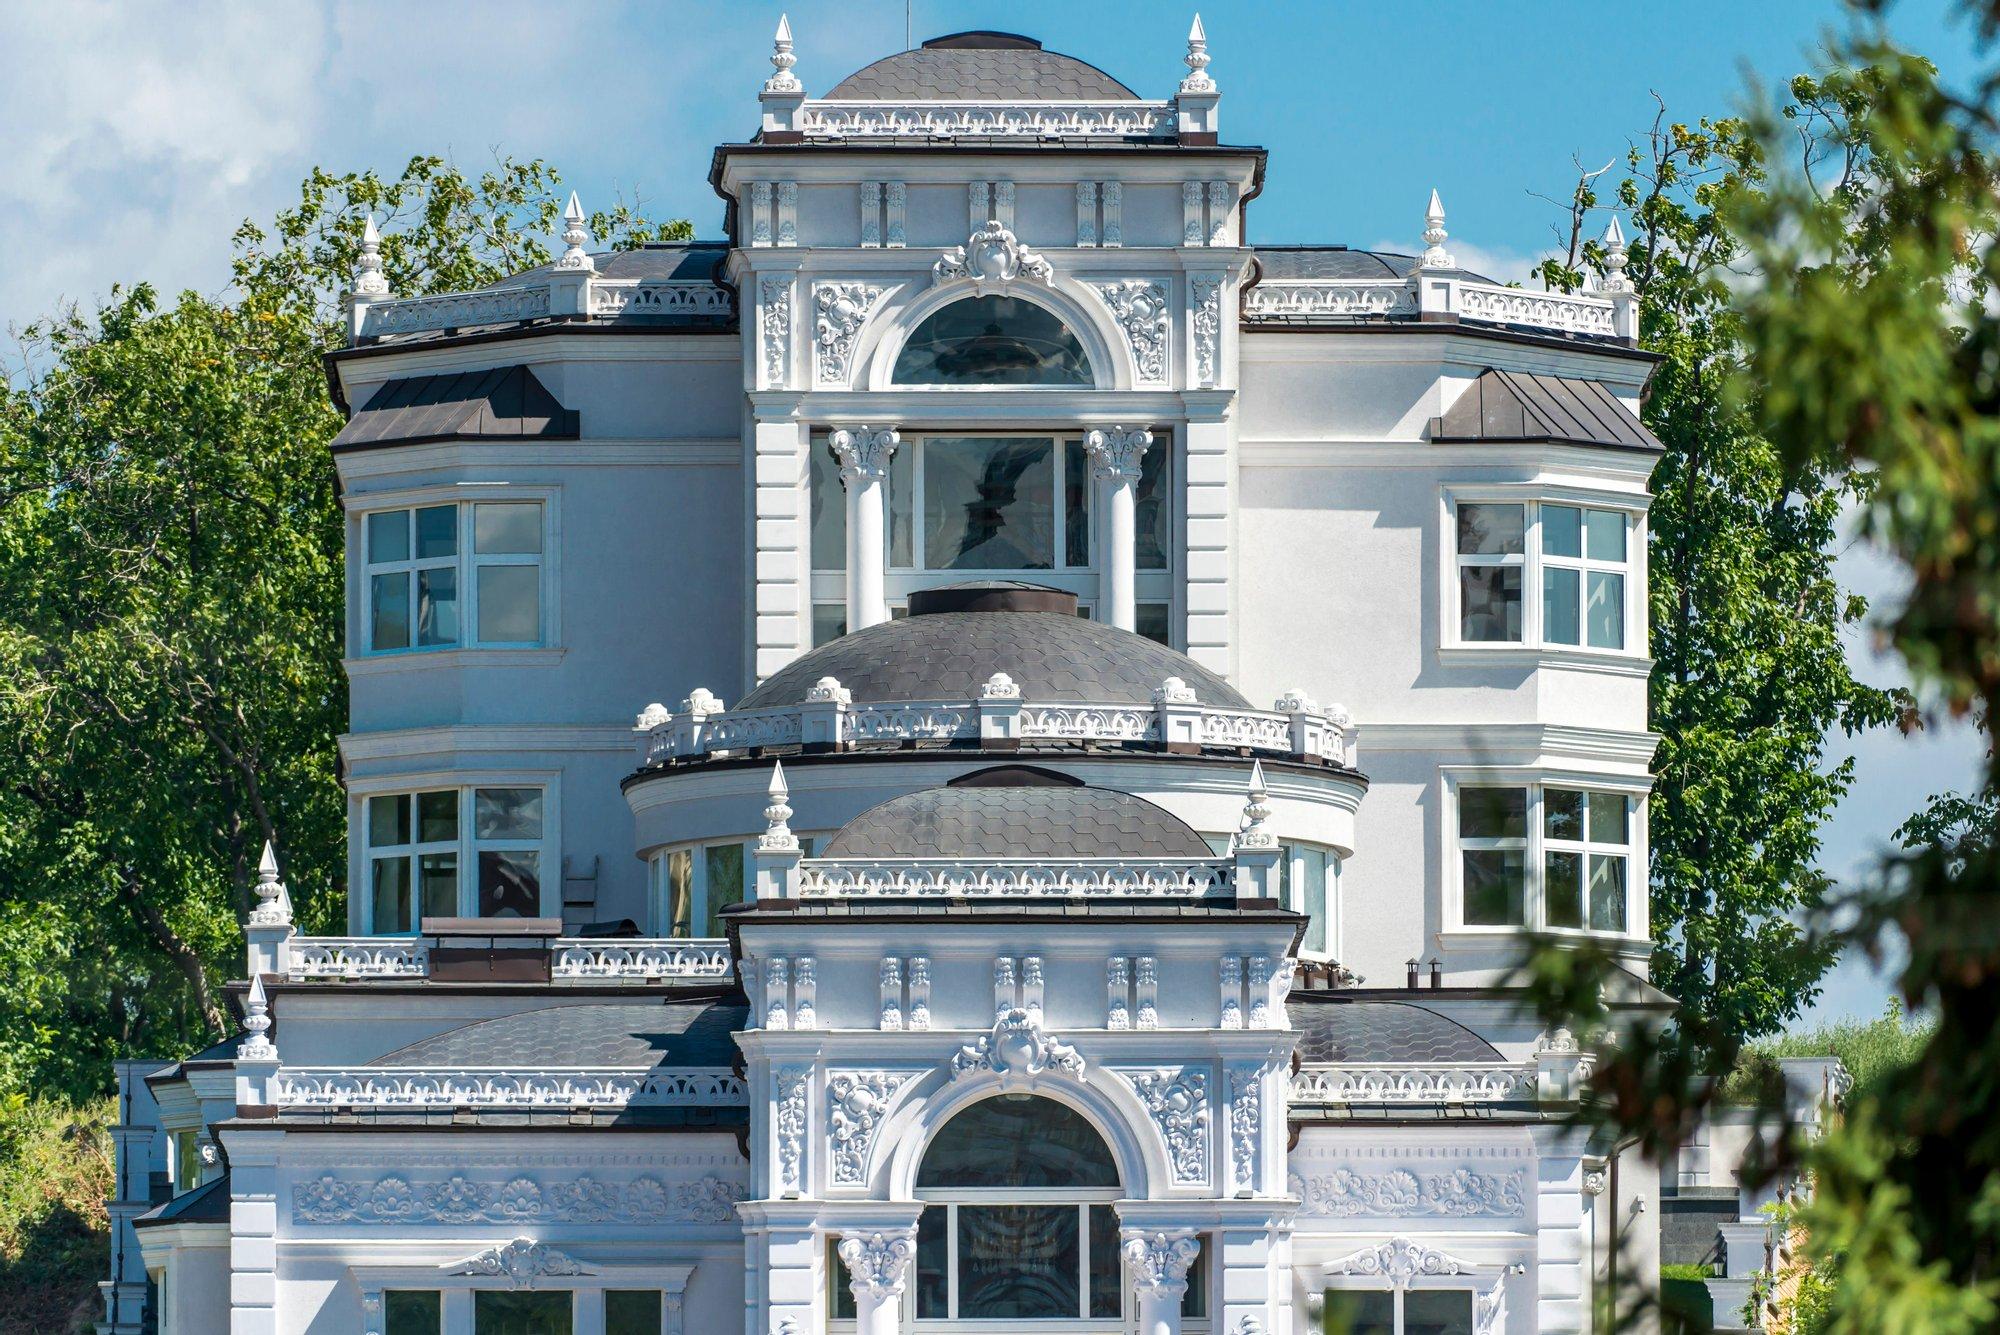 House in Pechers'kyi district, Ukraine 1